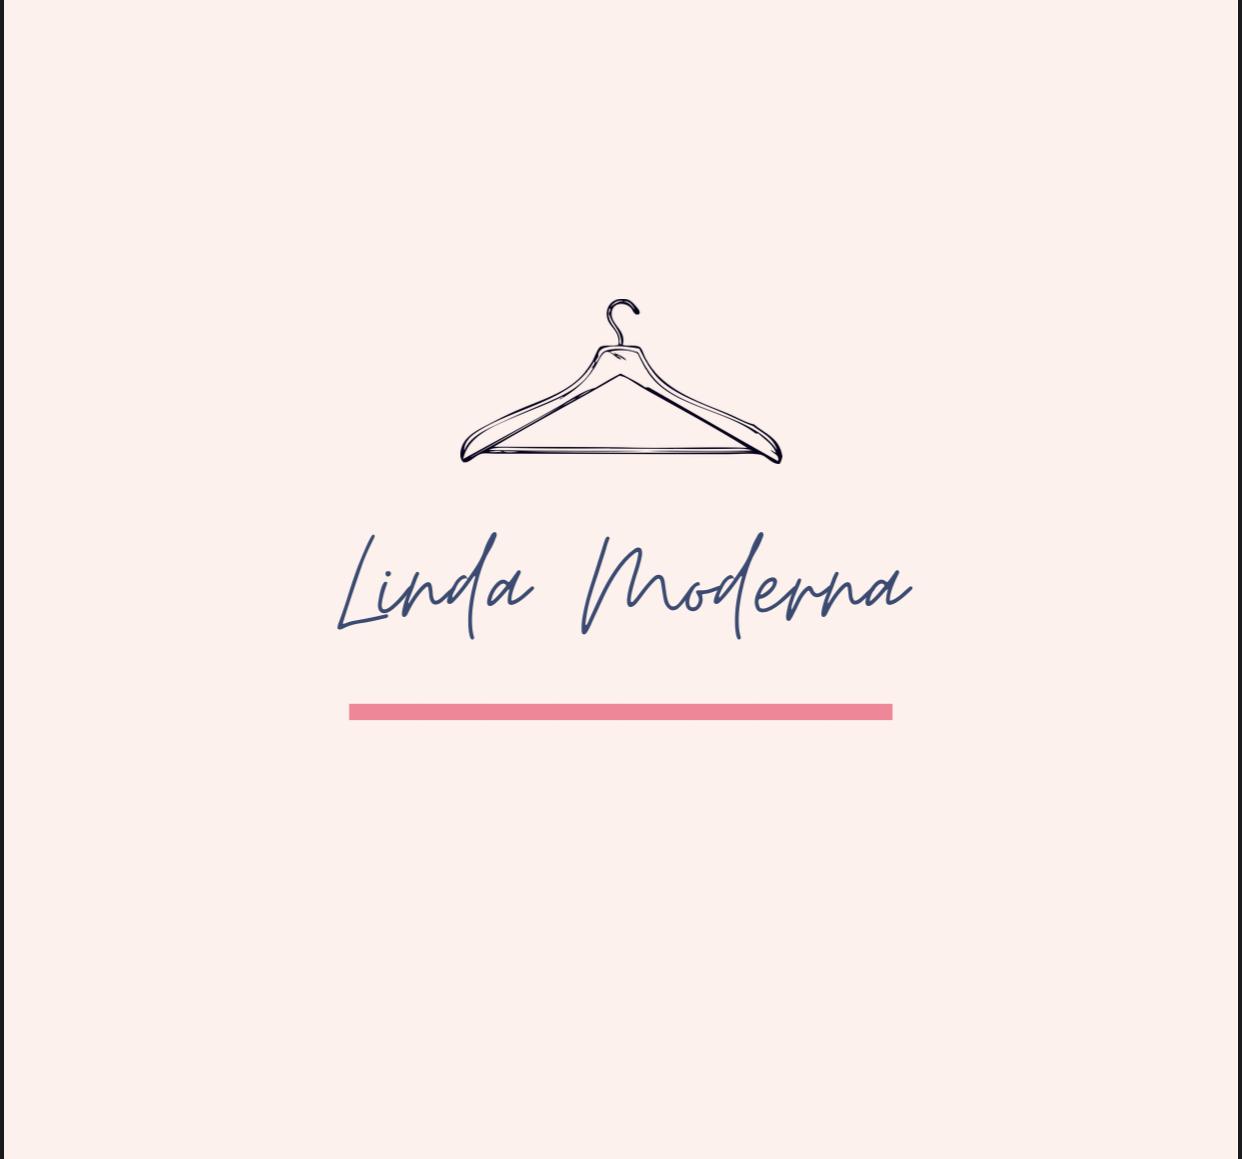 Linda Moderna